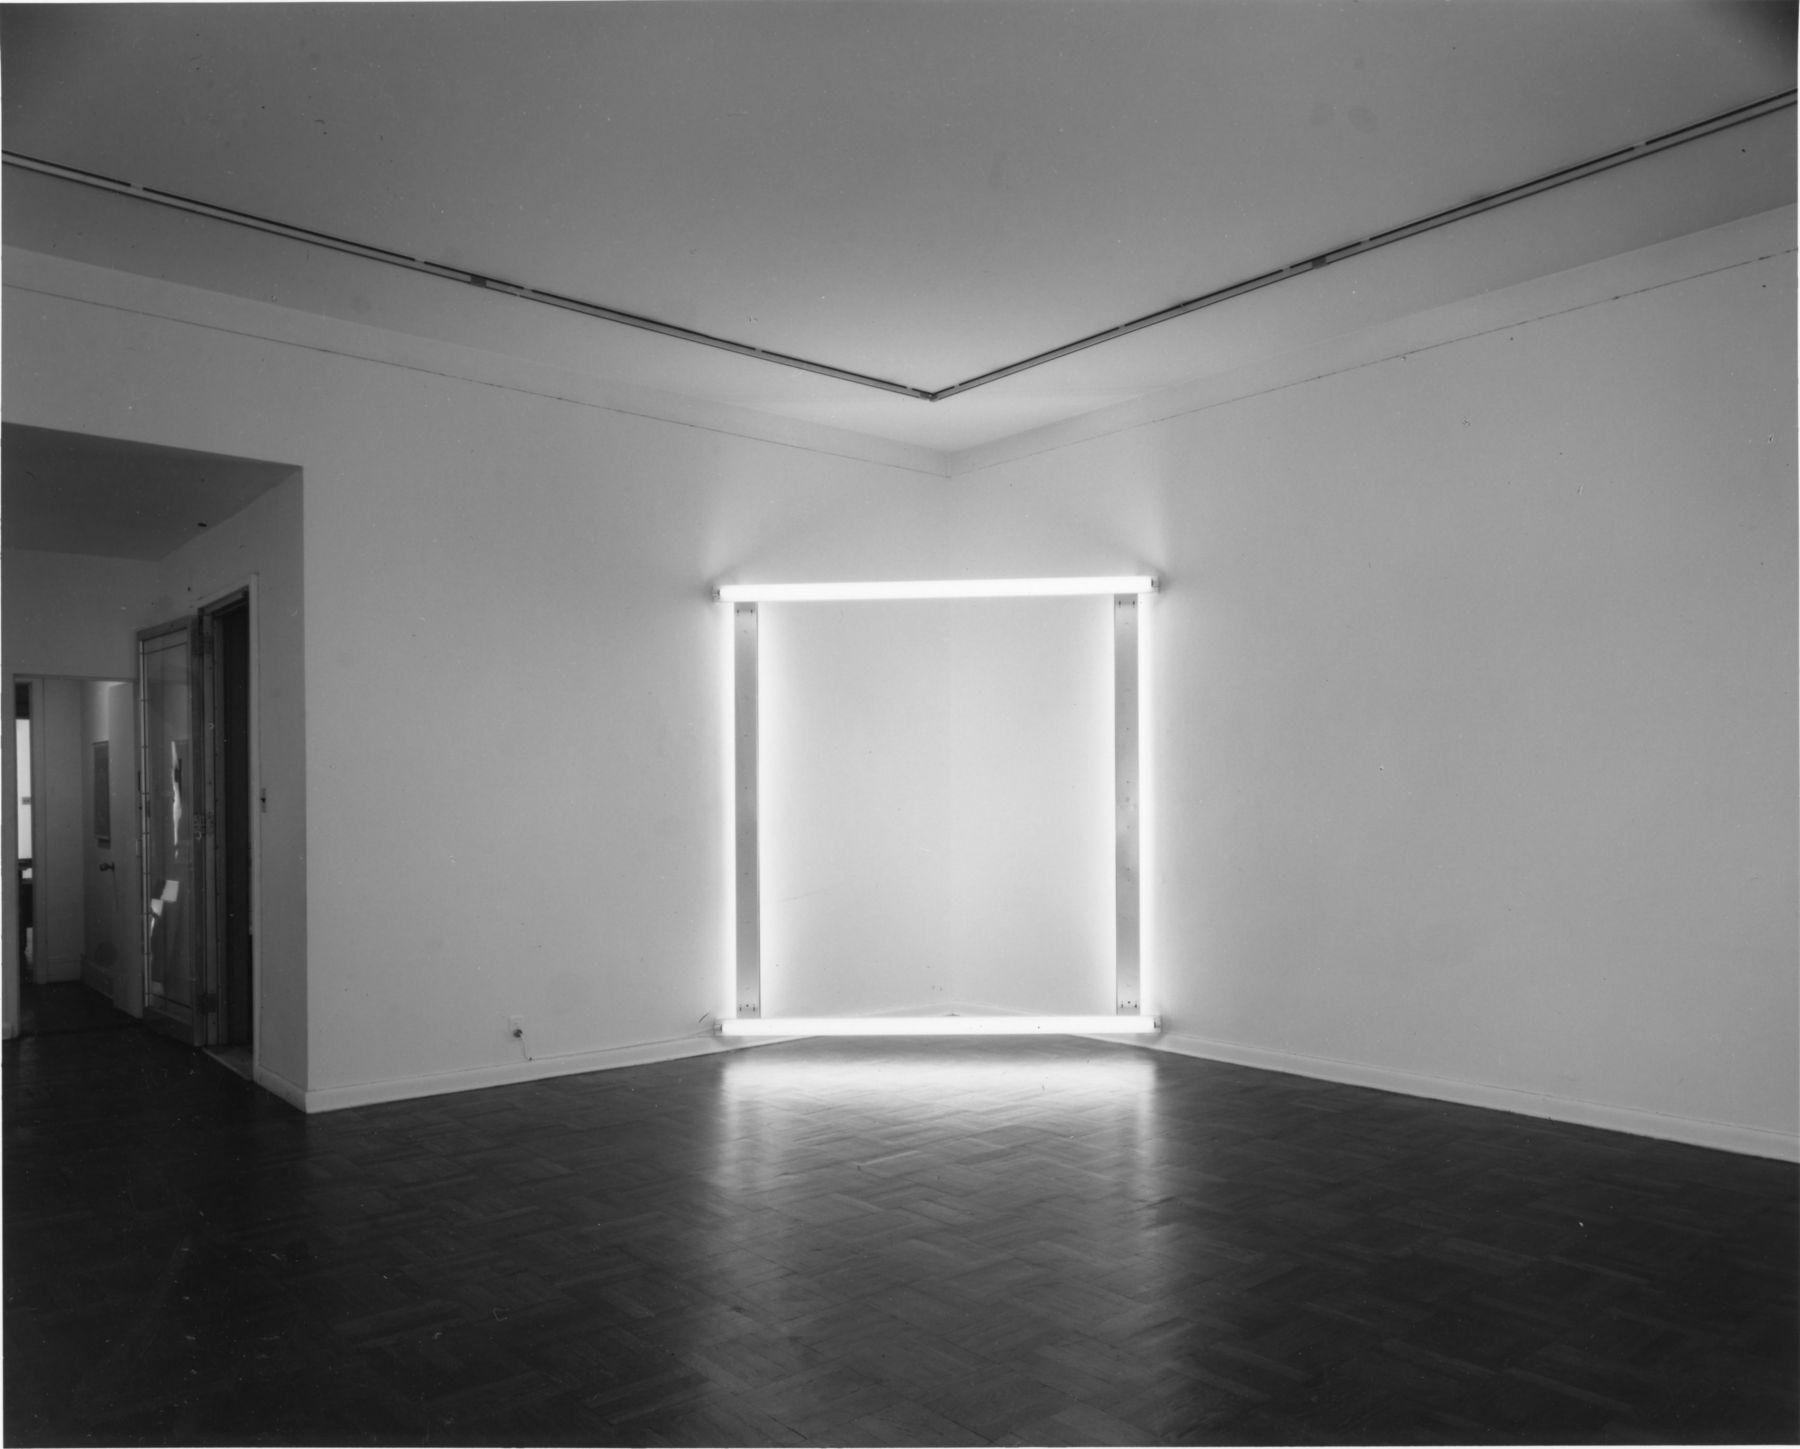 Installation view, Dan Flavin, 4 EAST 77